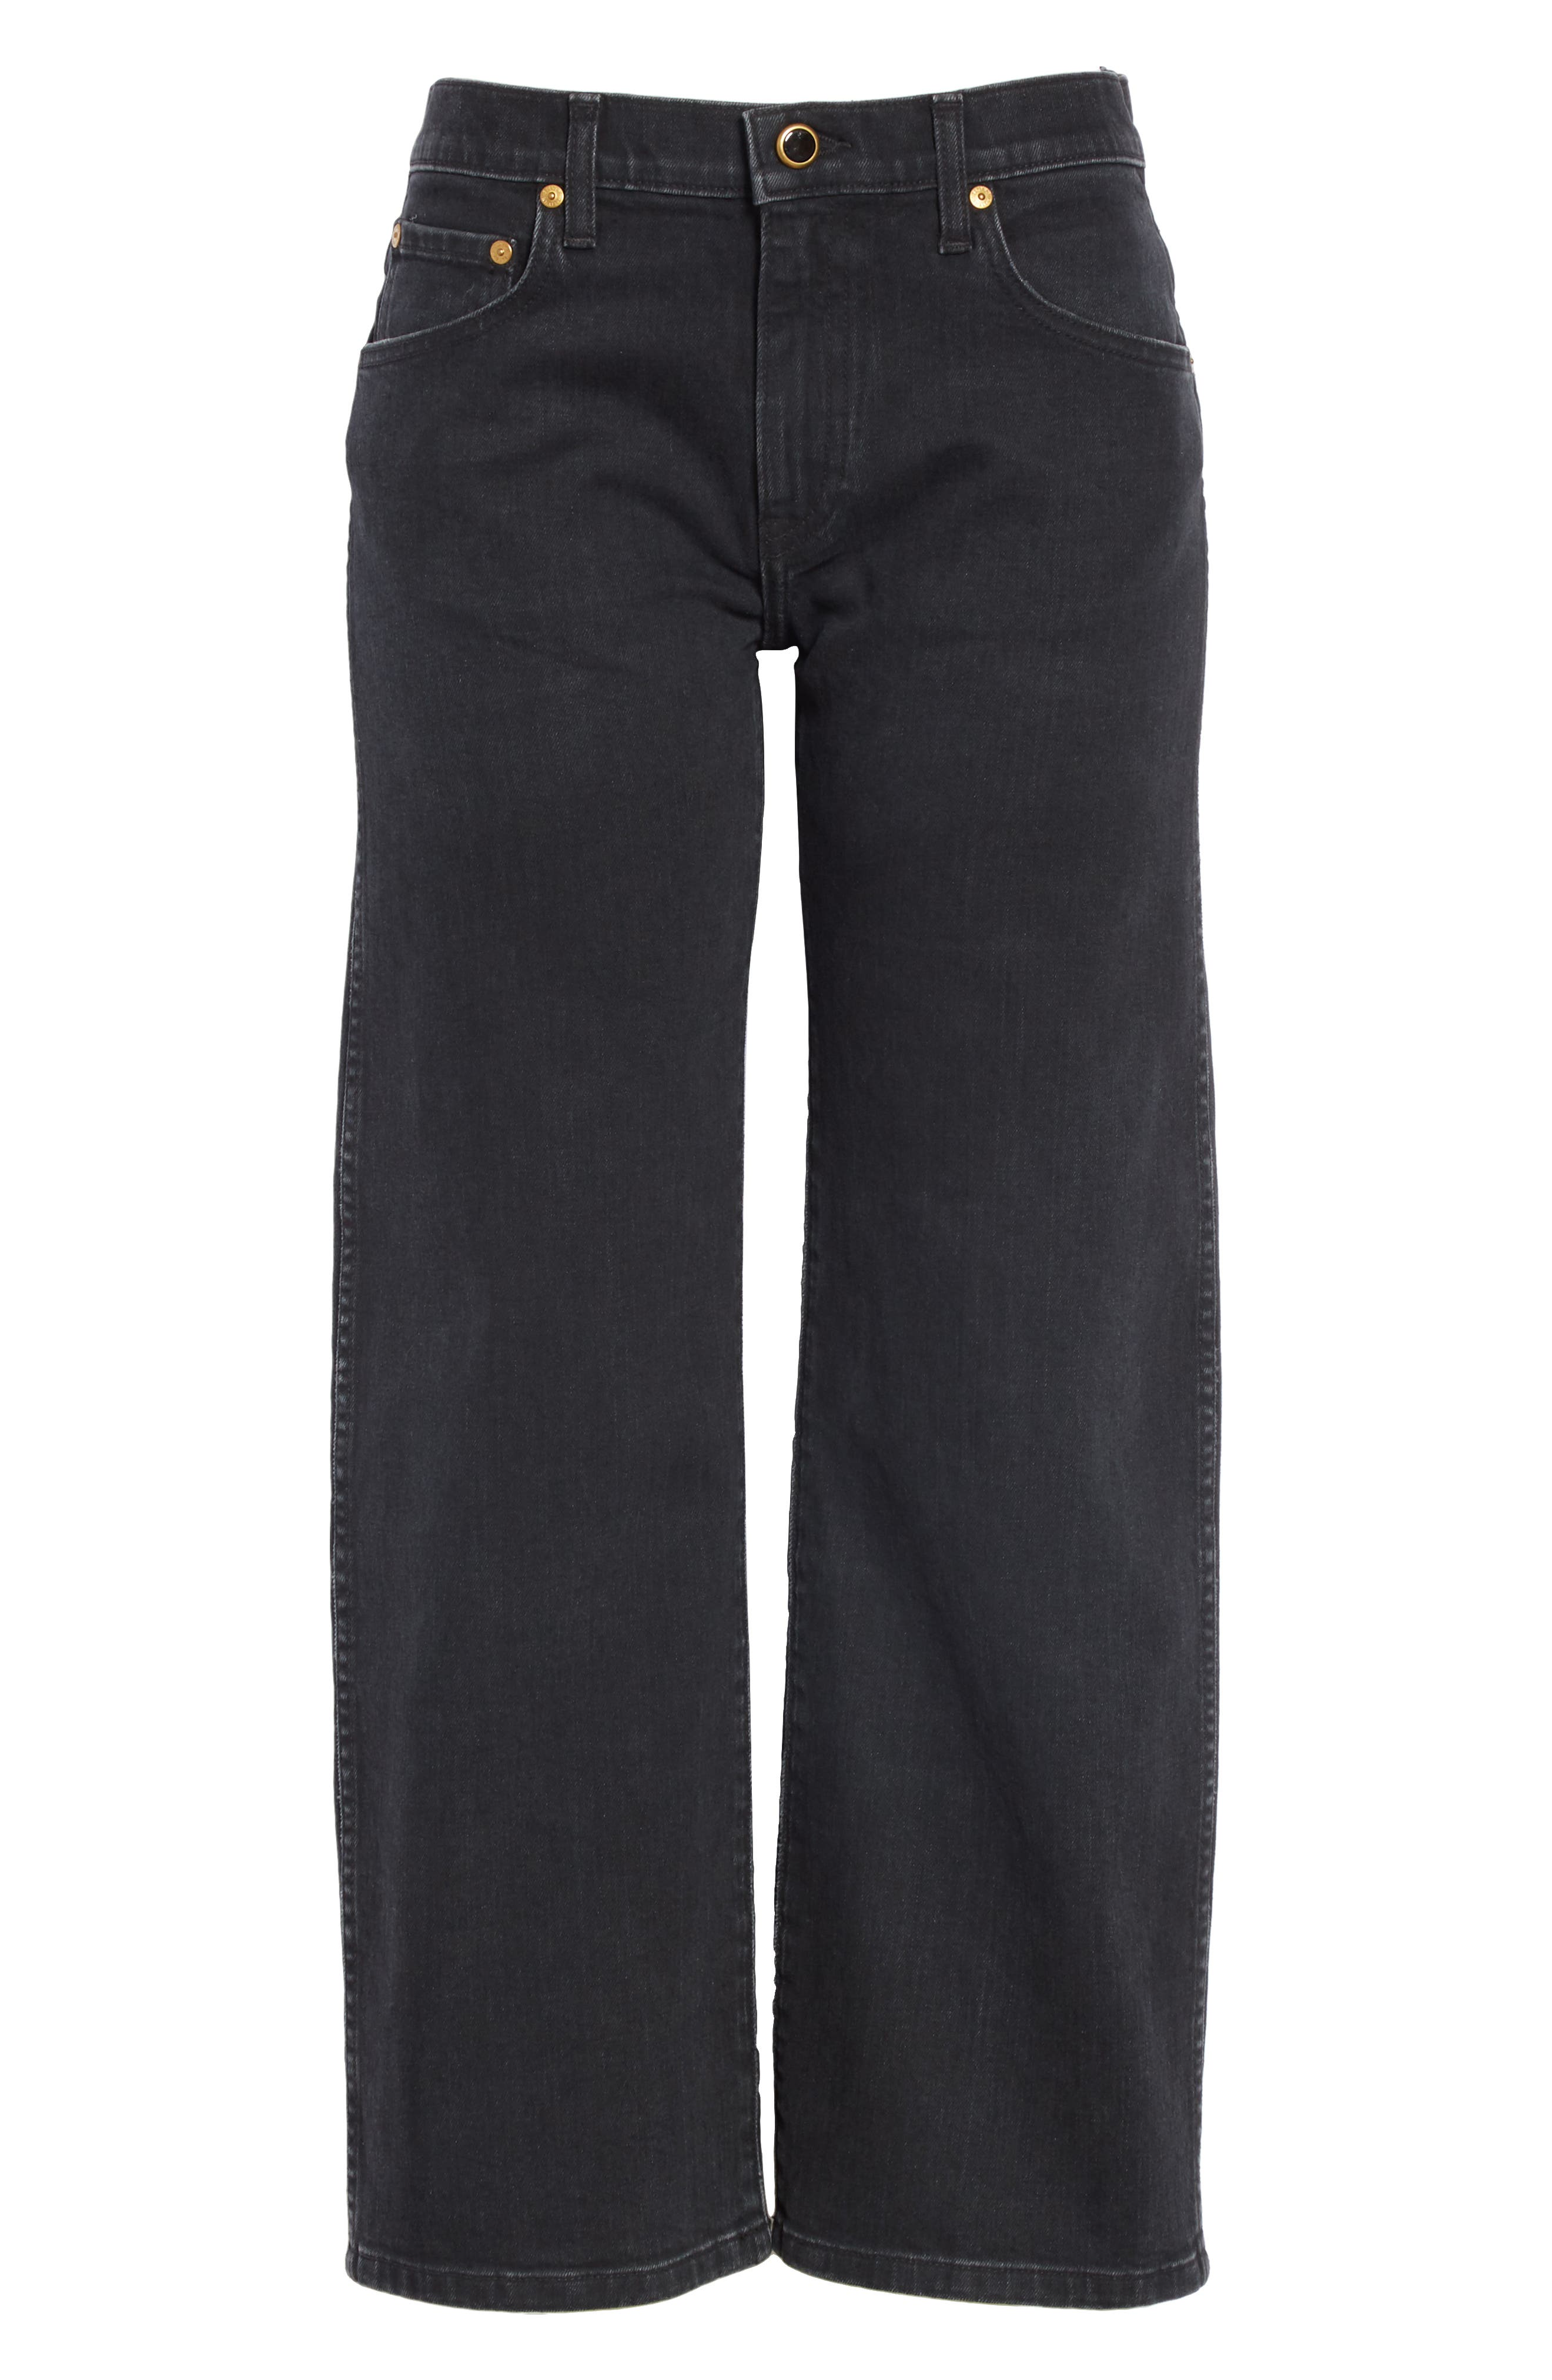 KHAITE,                             Wendell Wide Leg Crop Jeans,                             Alternate thumbnail 6, color,                             STONED BLACK